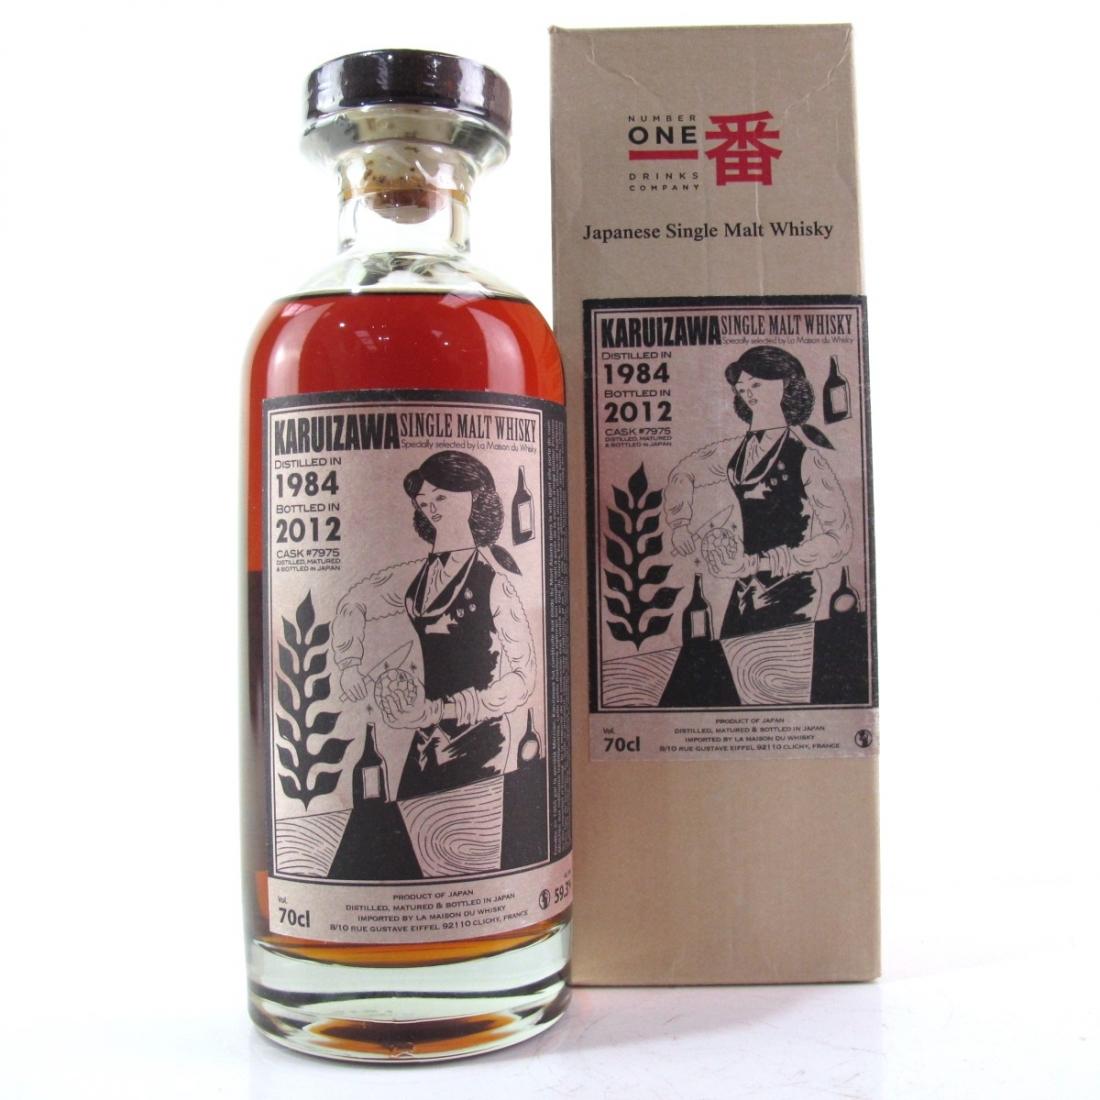 Karuizawa 1984 Cocktail Series Cask #7975